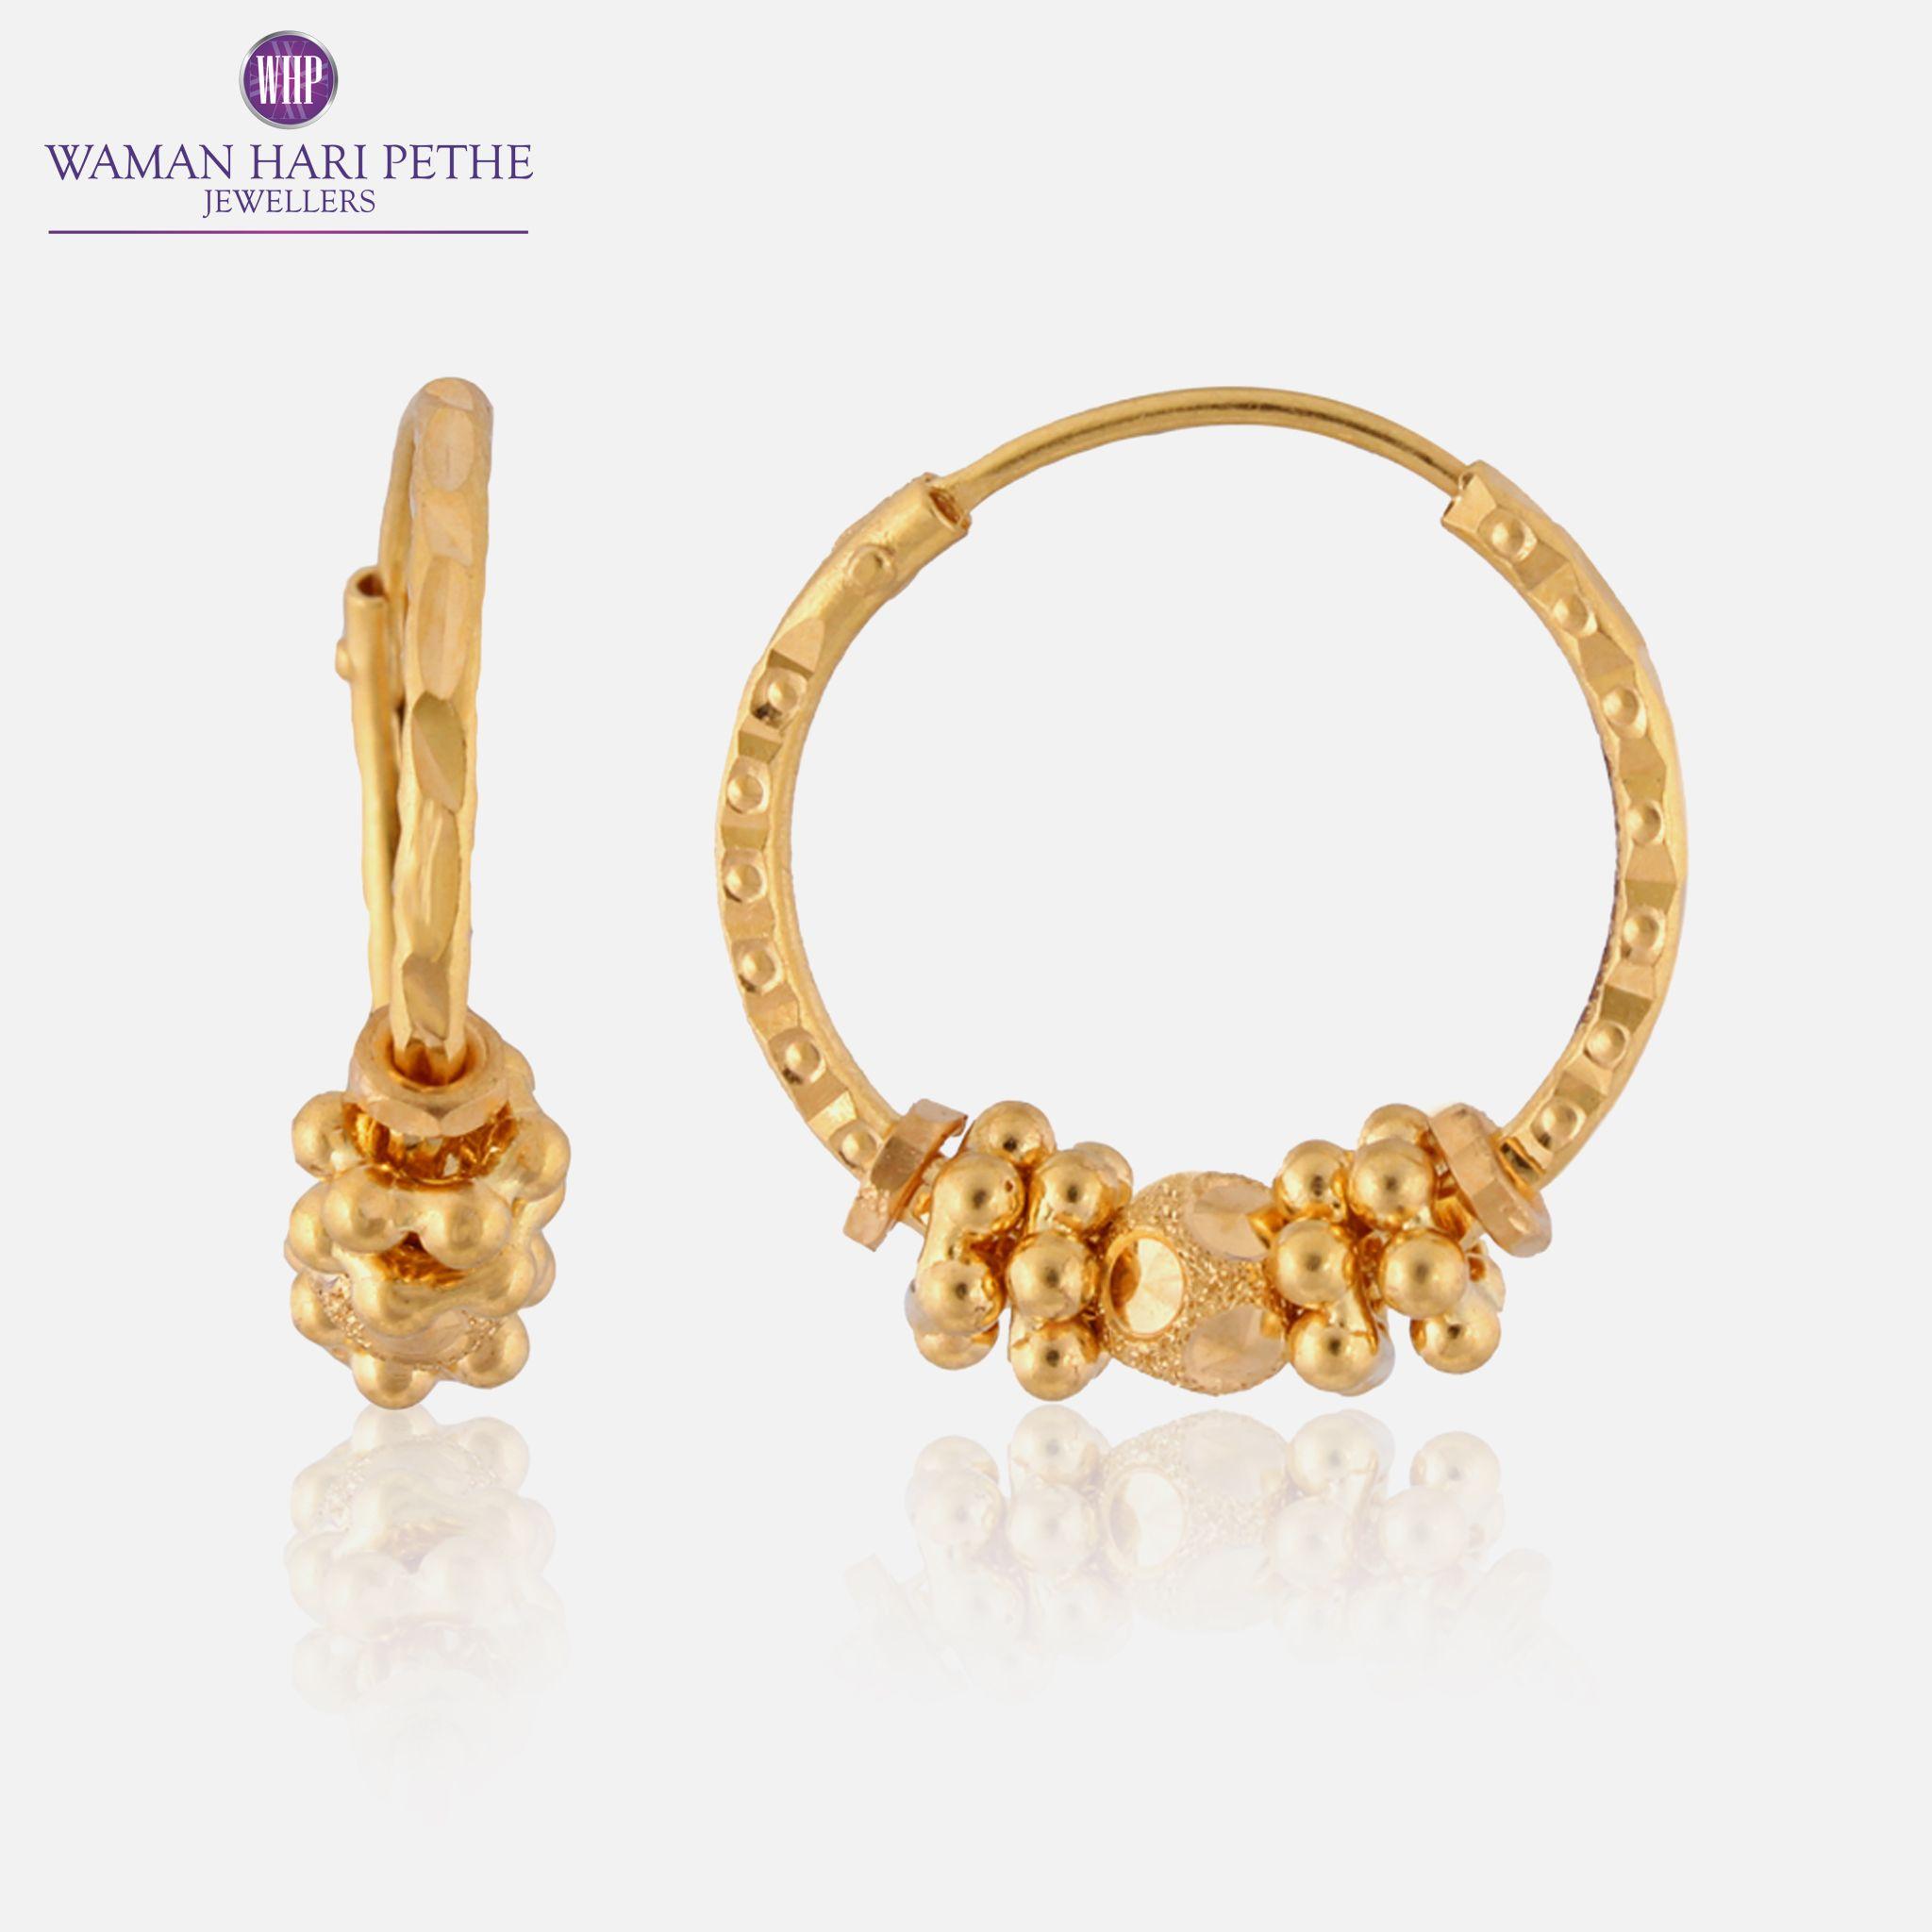 Waman Hari Pethe Jewellers Gold Rings Design With Price — Mediwiki ...